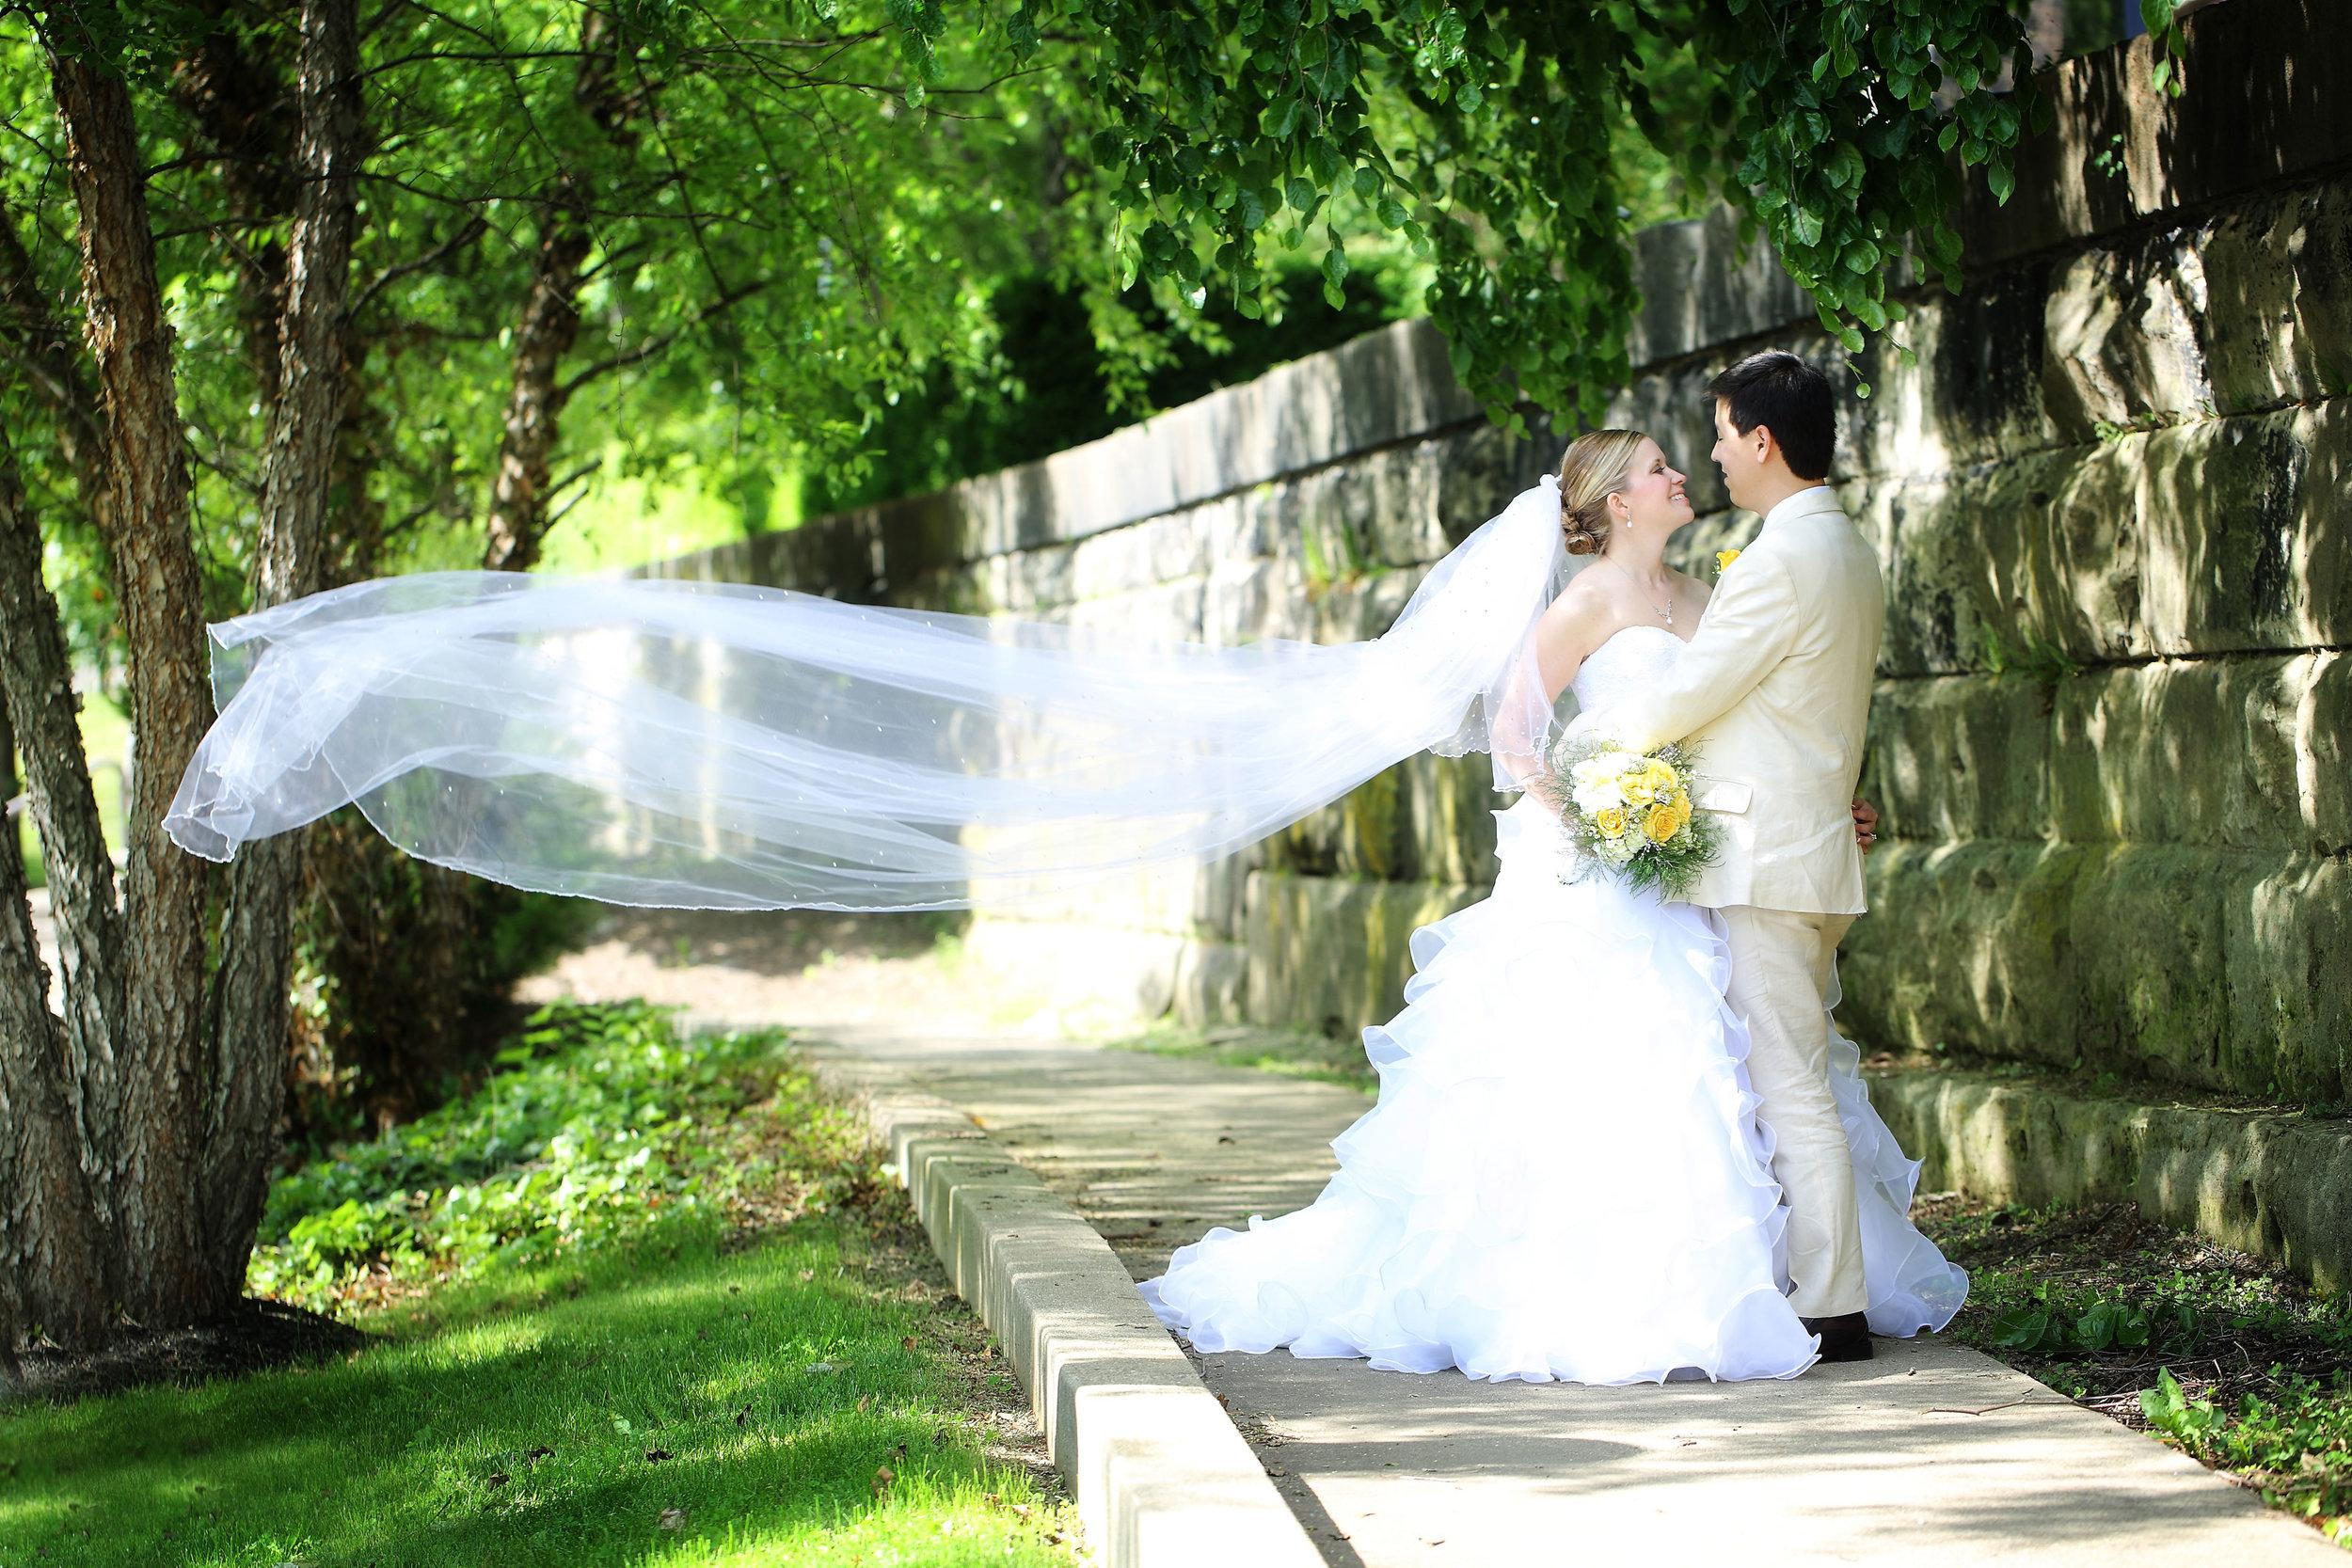 Tamara-Green_Wedding-Photography-11.jpg